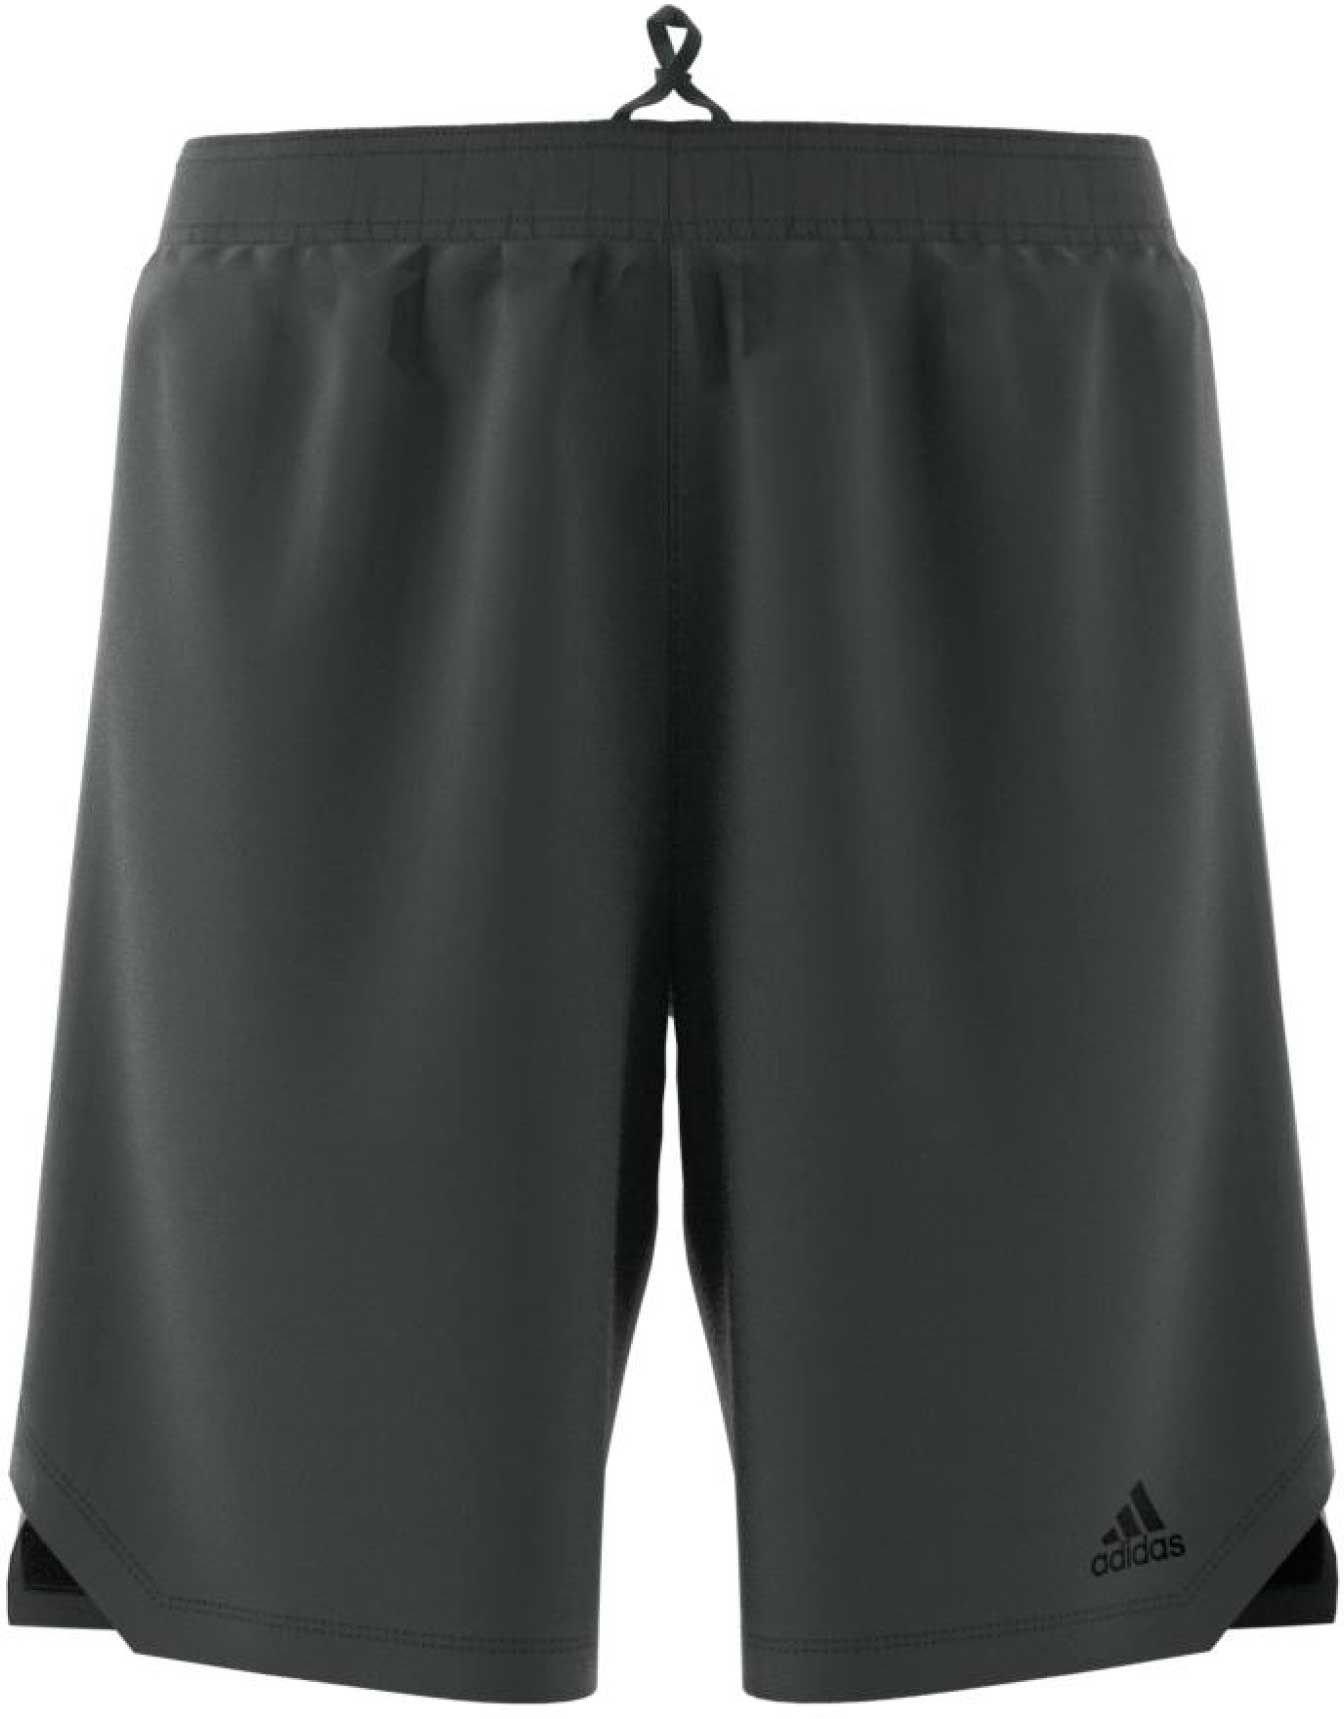 adidas Men's Axis Knit Training Shorts (DGH/Black, XL)